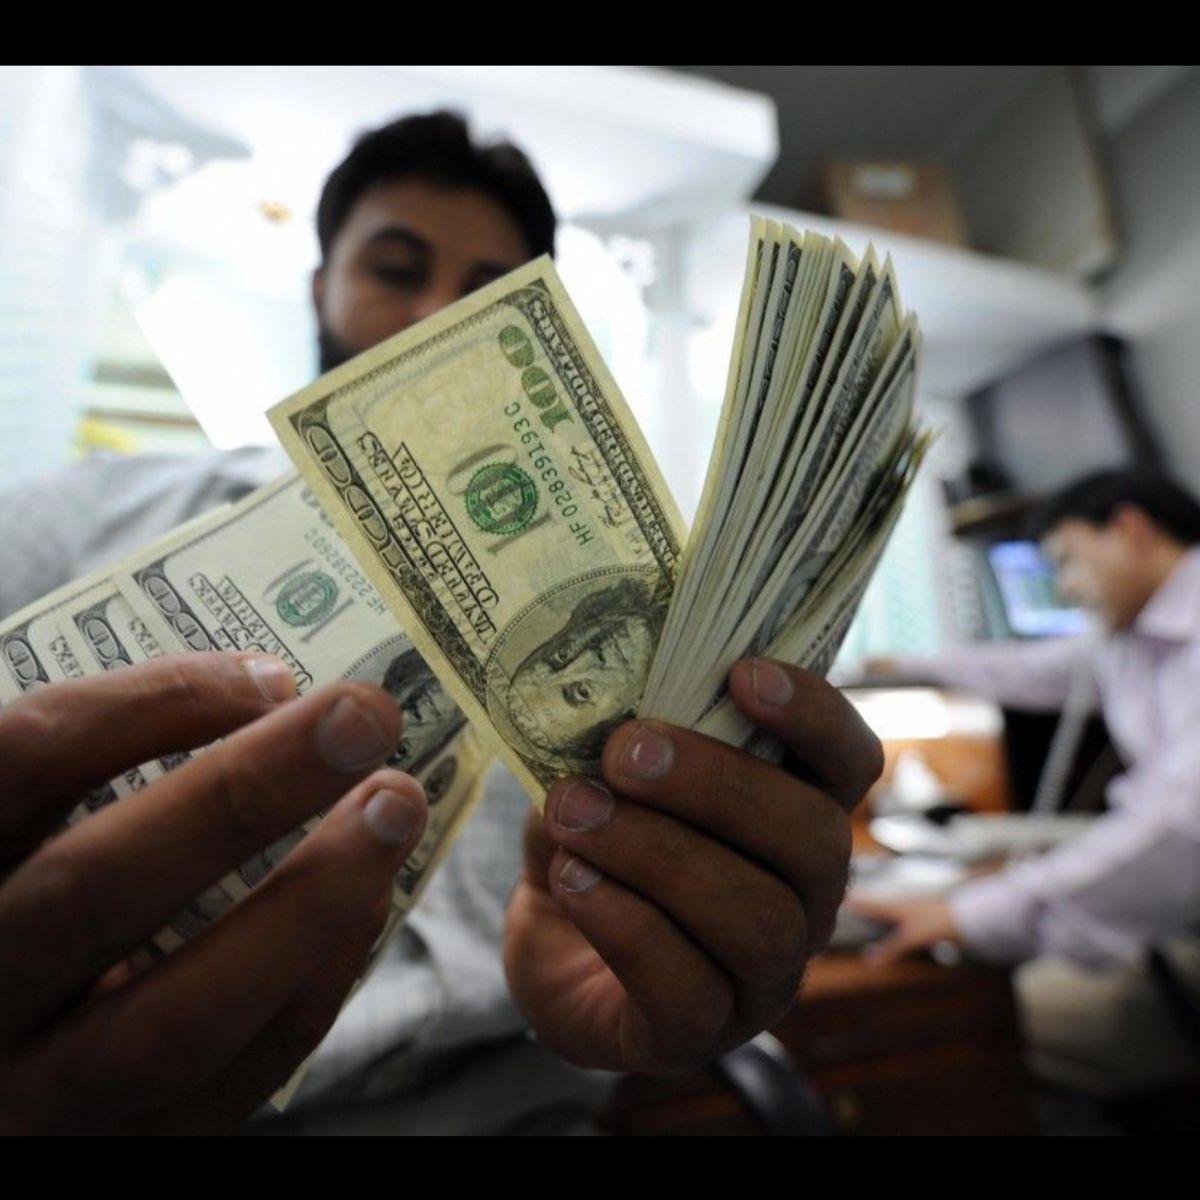 Se busca abrir un banco para indocumentados en California